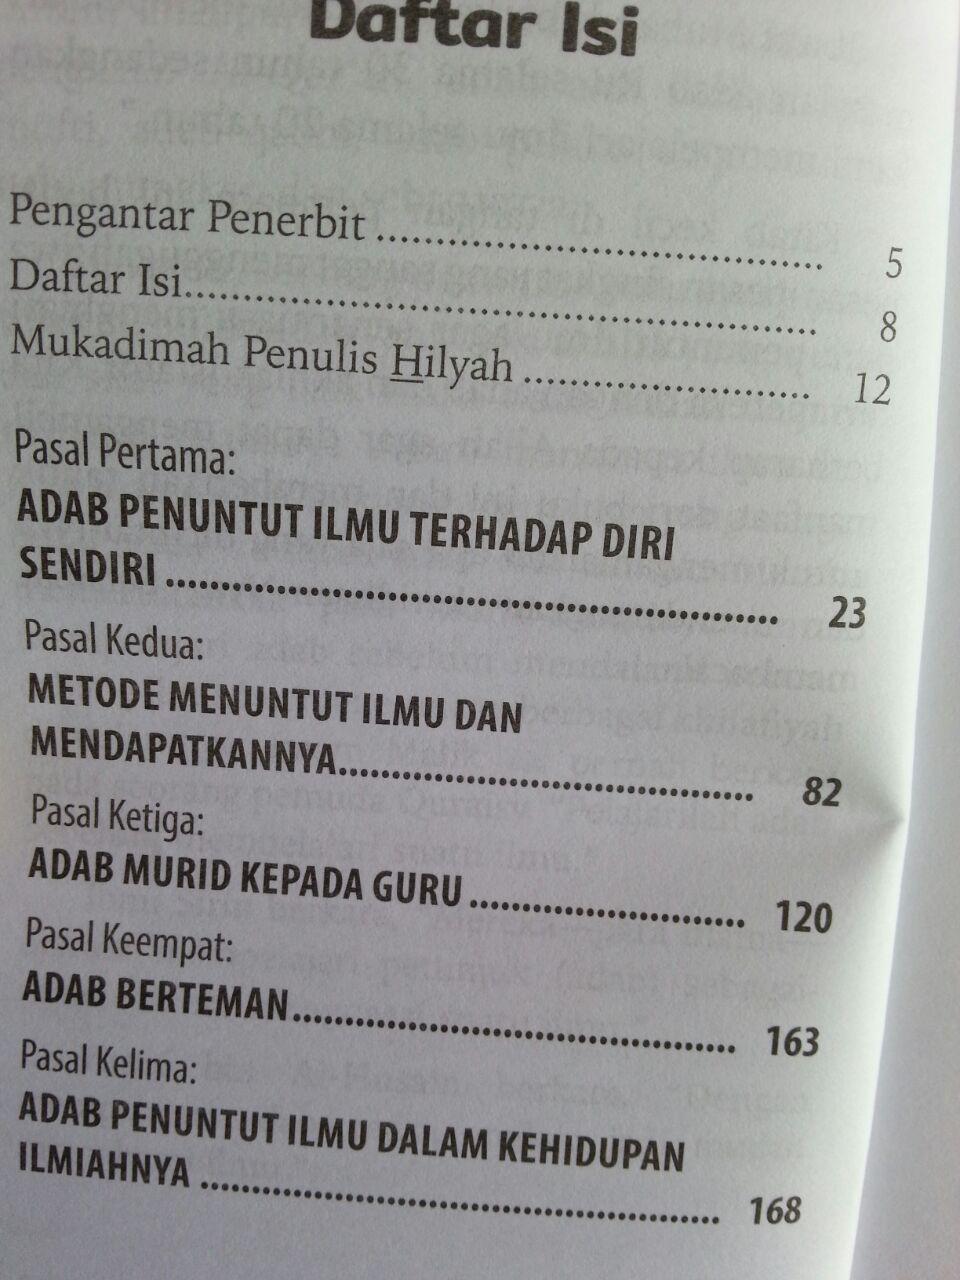 Buku Hilyah Thalib Al-Ilmi Pedoman Adab Akhlak Penuntut Ilmu isi